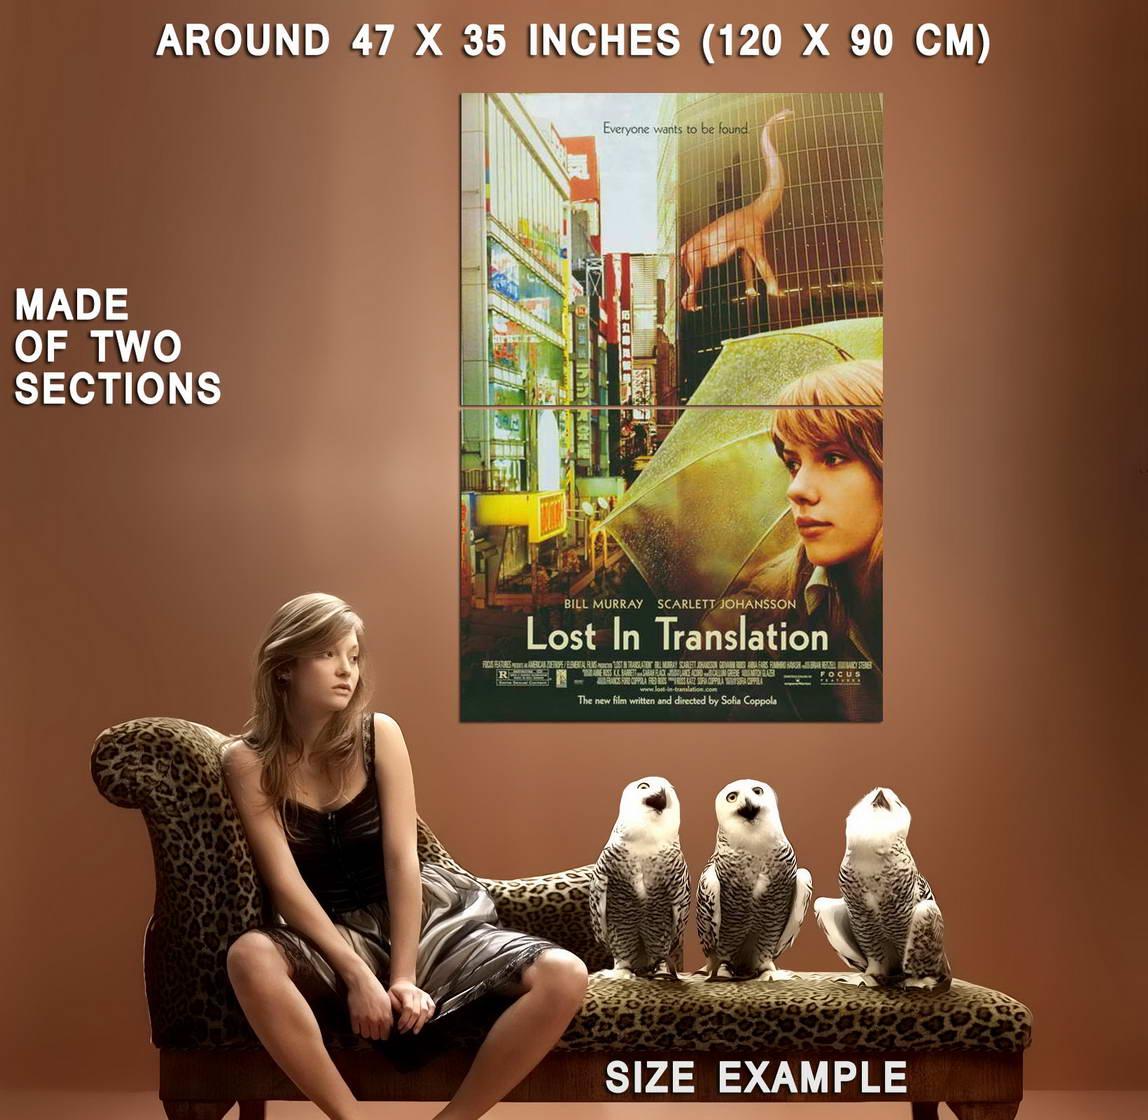 67266 Lost in Translation Scarlett Johansson Bill Wall Print Poster Affiche